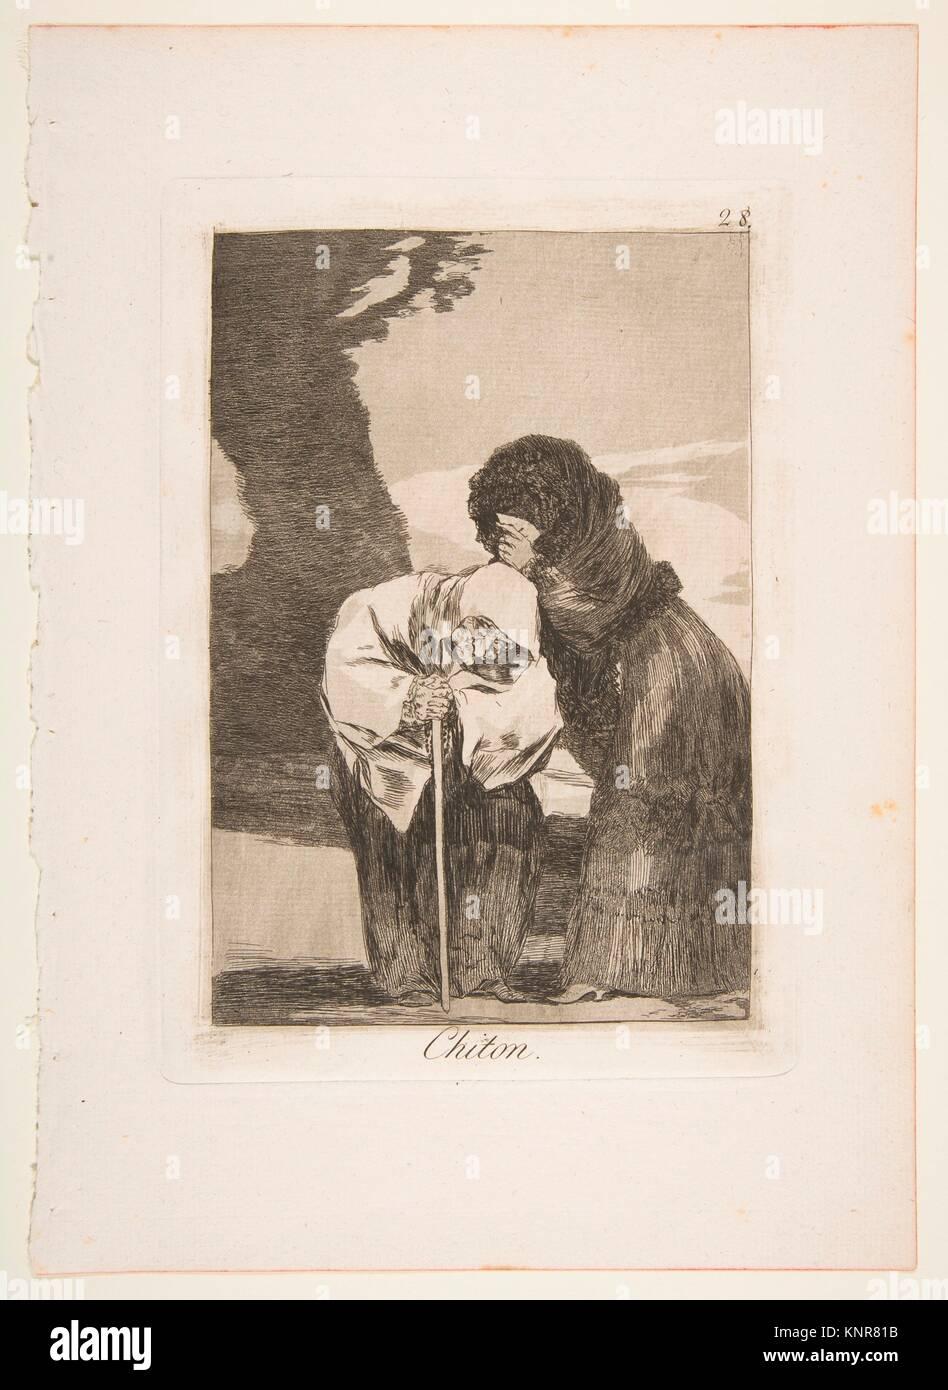 Plate 28 from 'Los Caprichos': Hush (Chiton.). Series/Portfolio: Los Caprichos; Artist: Goya (Francisco - Stock Image